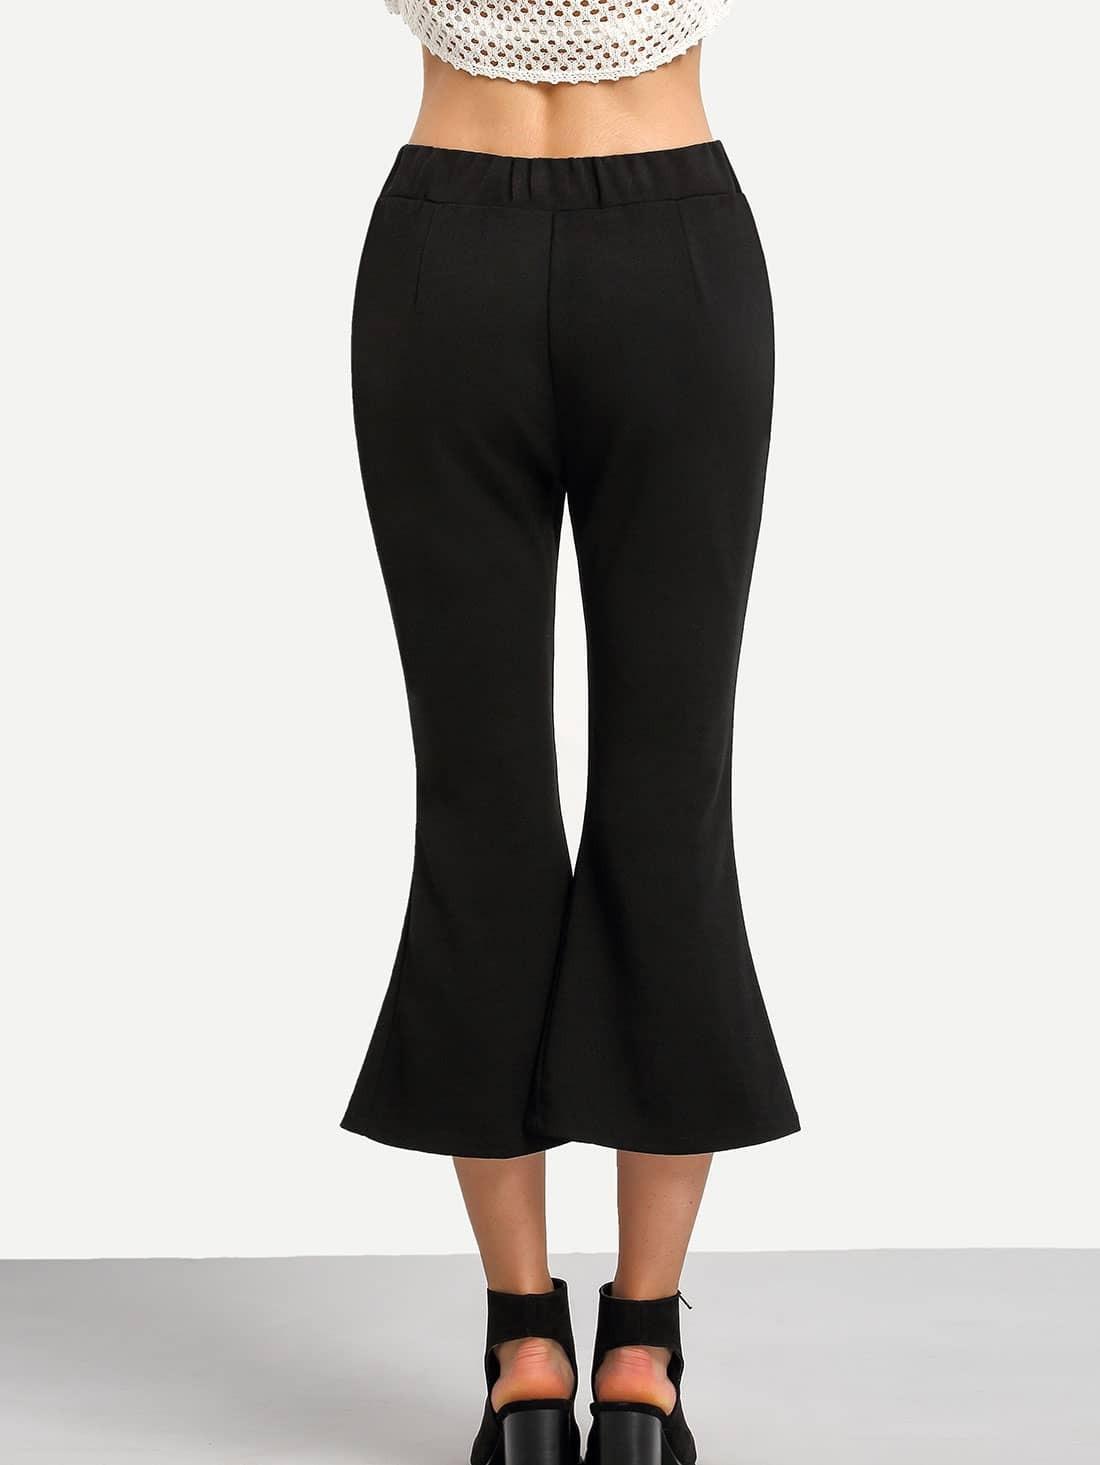 pantalon fendu noir french shein sheinside. Black Bedroom Furniture Sets. Home Design Ideas